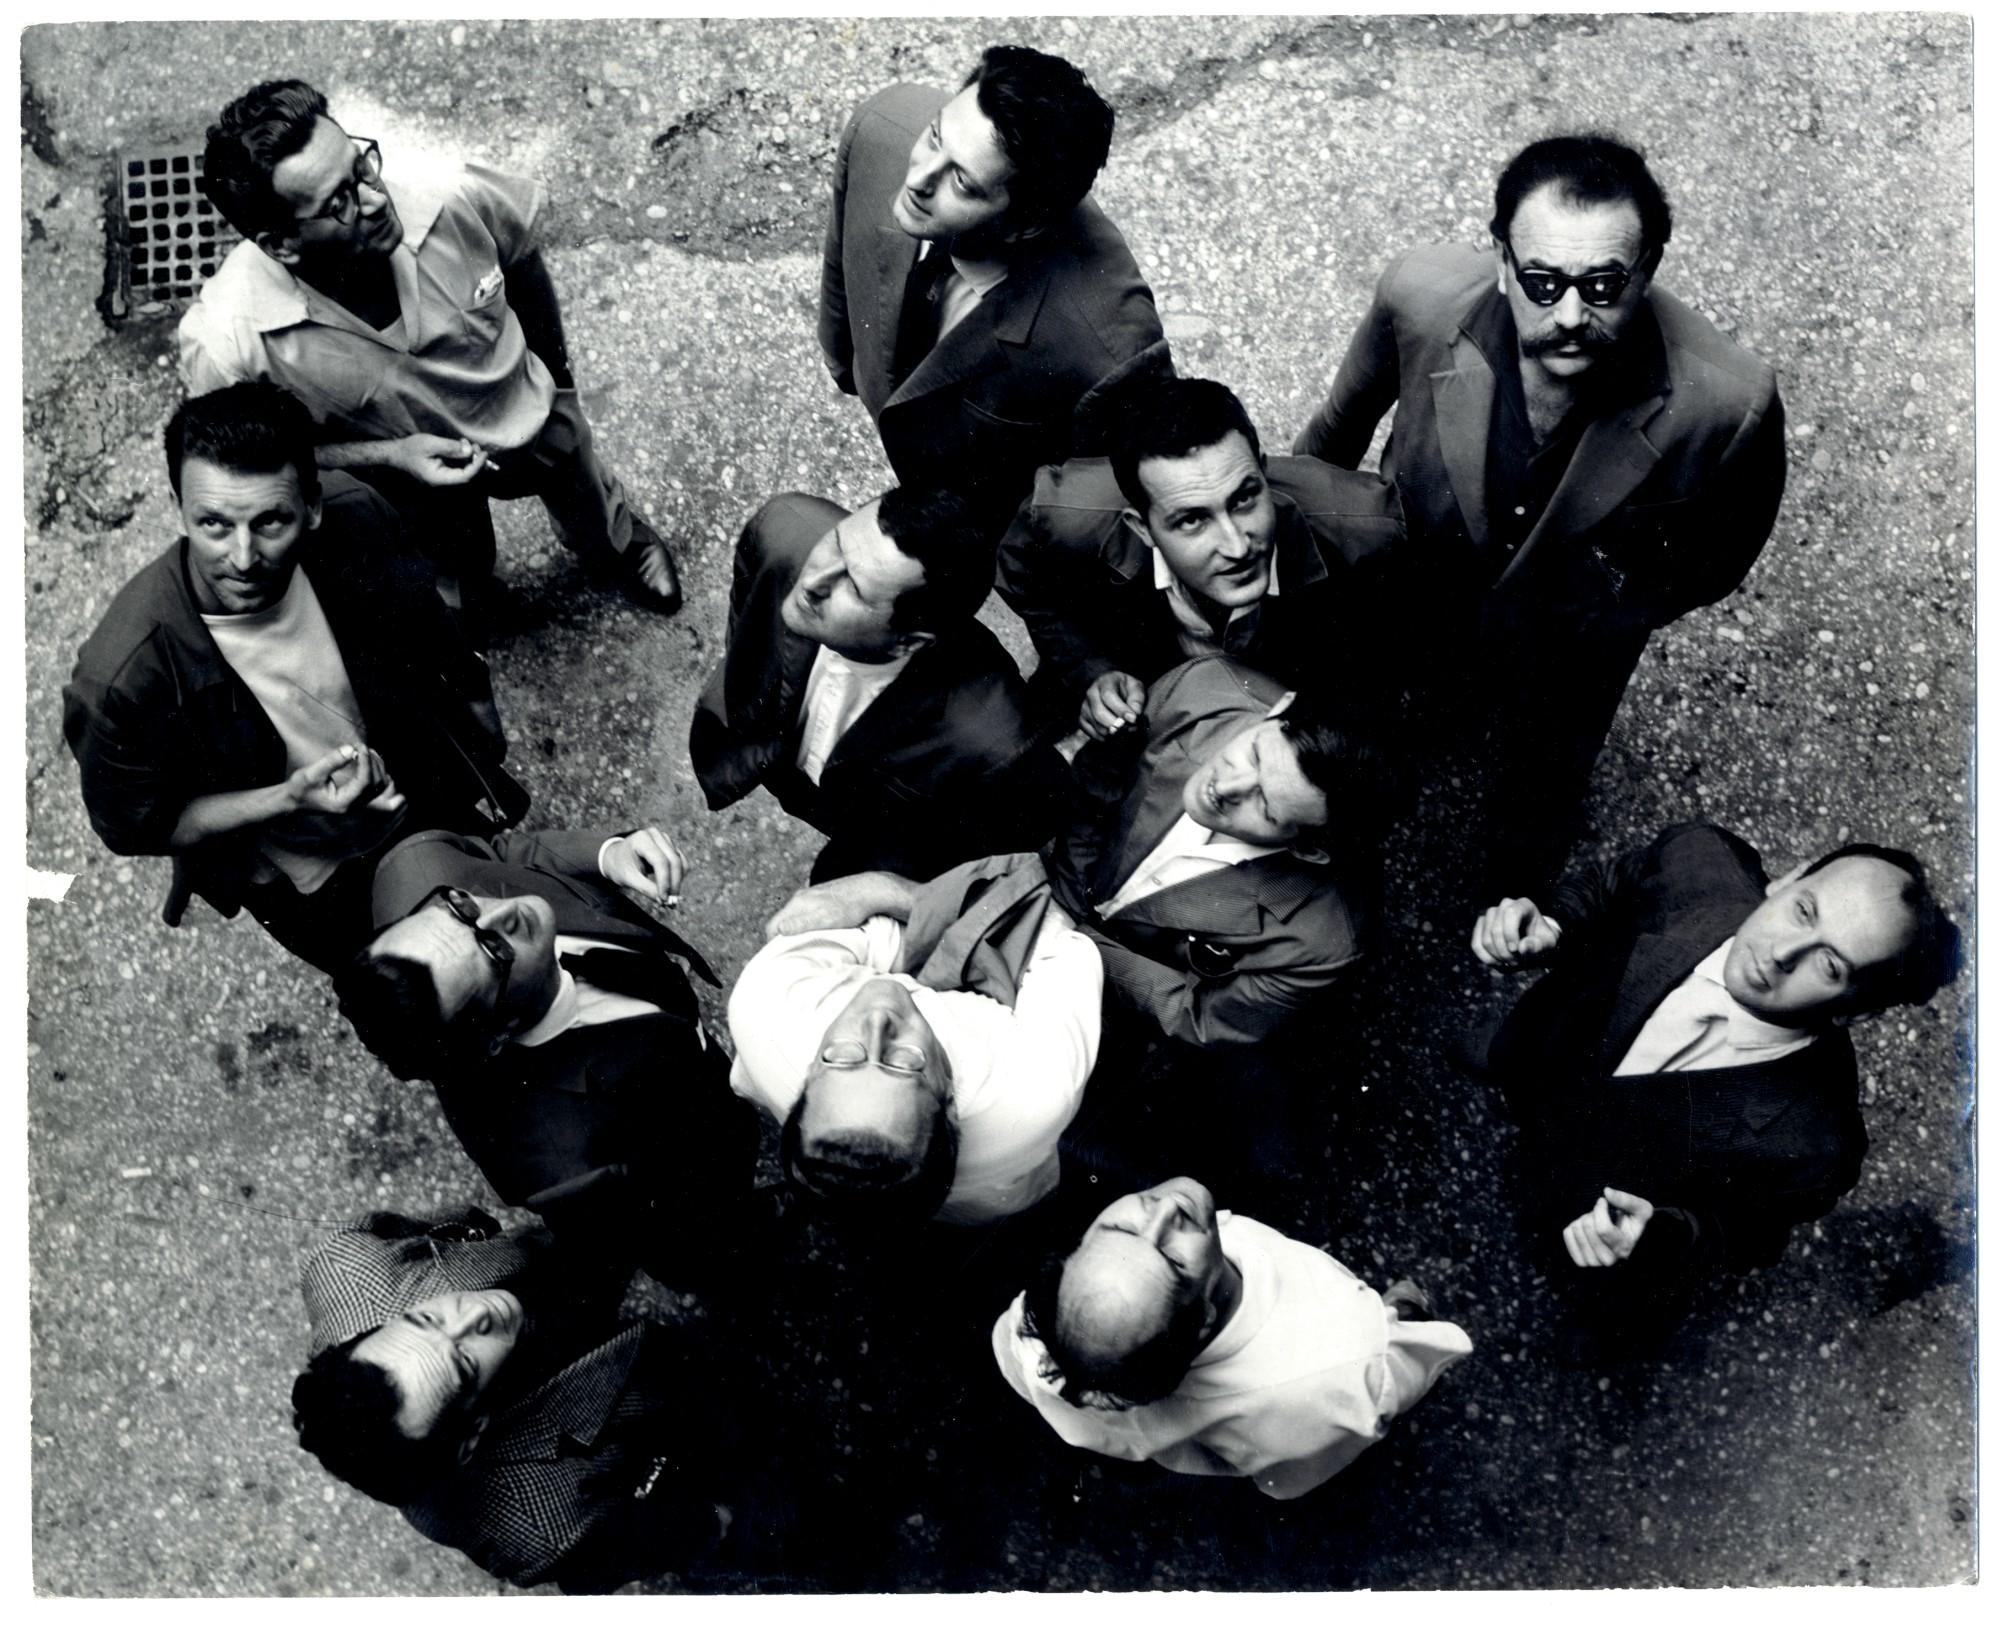 Gorgona Group, Gorgona is Looking at the Sky, 1961, bw photograph, collective work,242 x 299 mm, photographer Branko Balić.